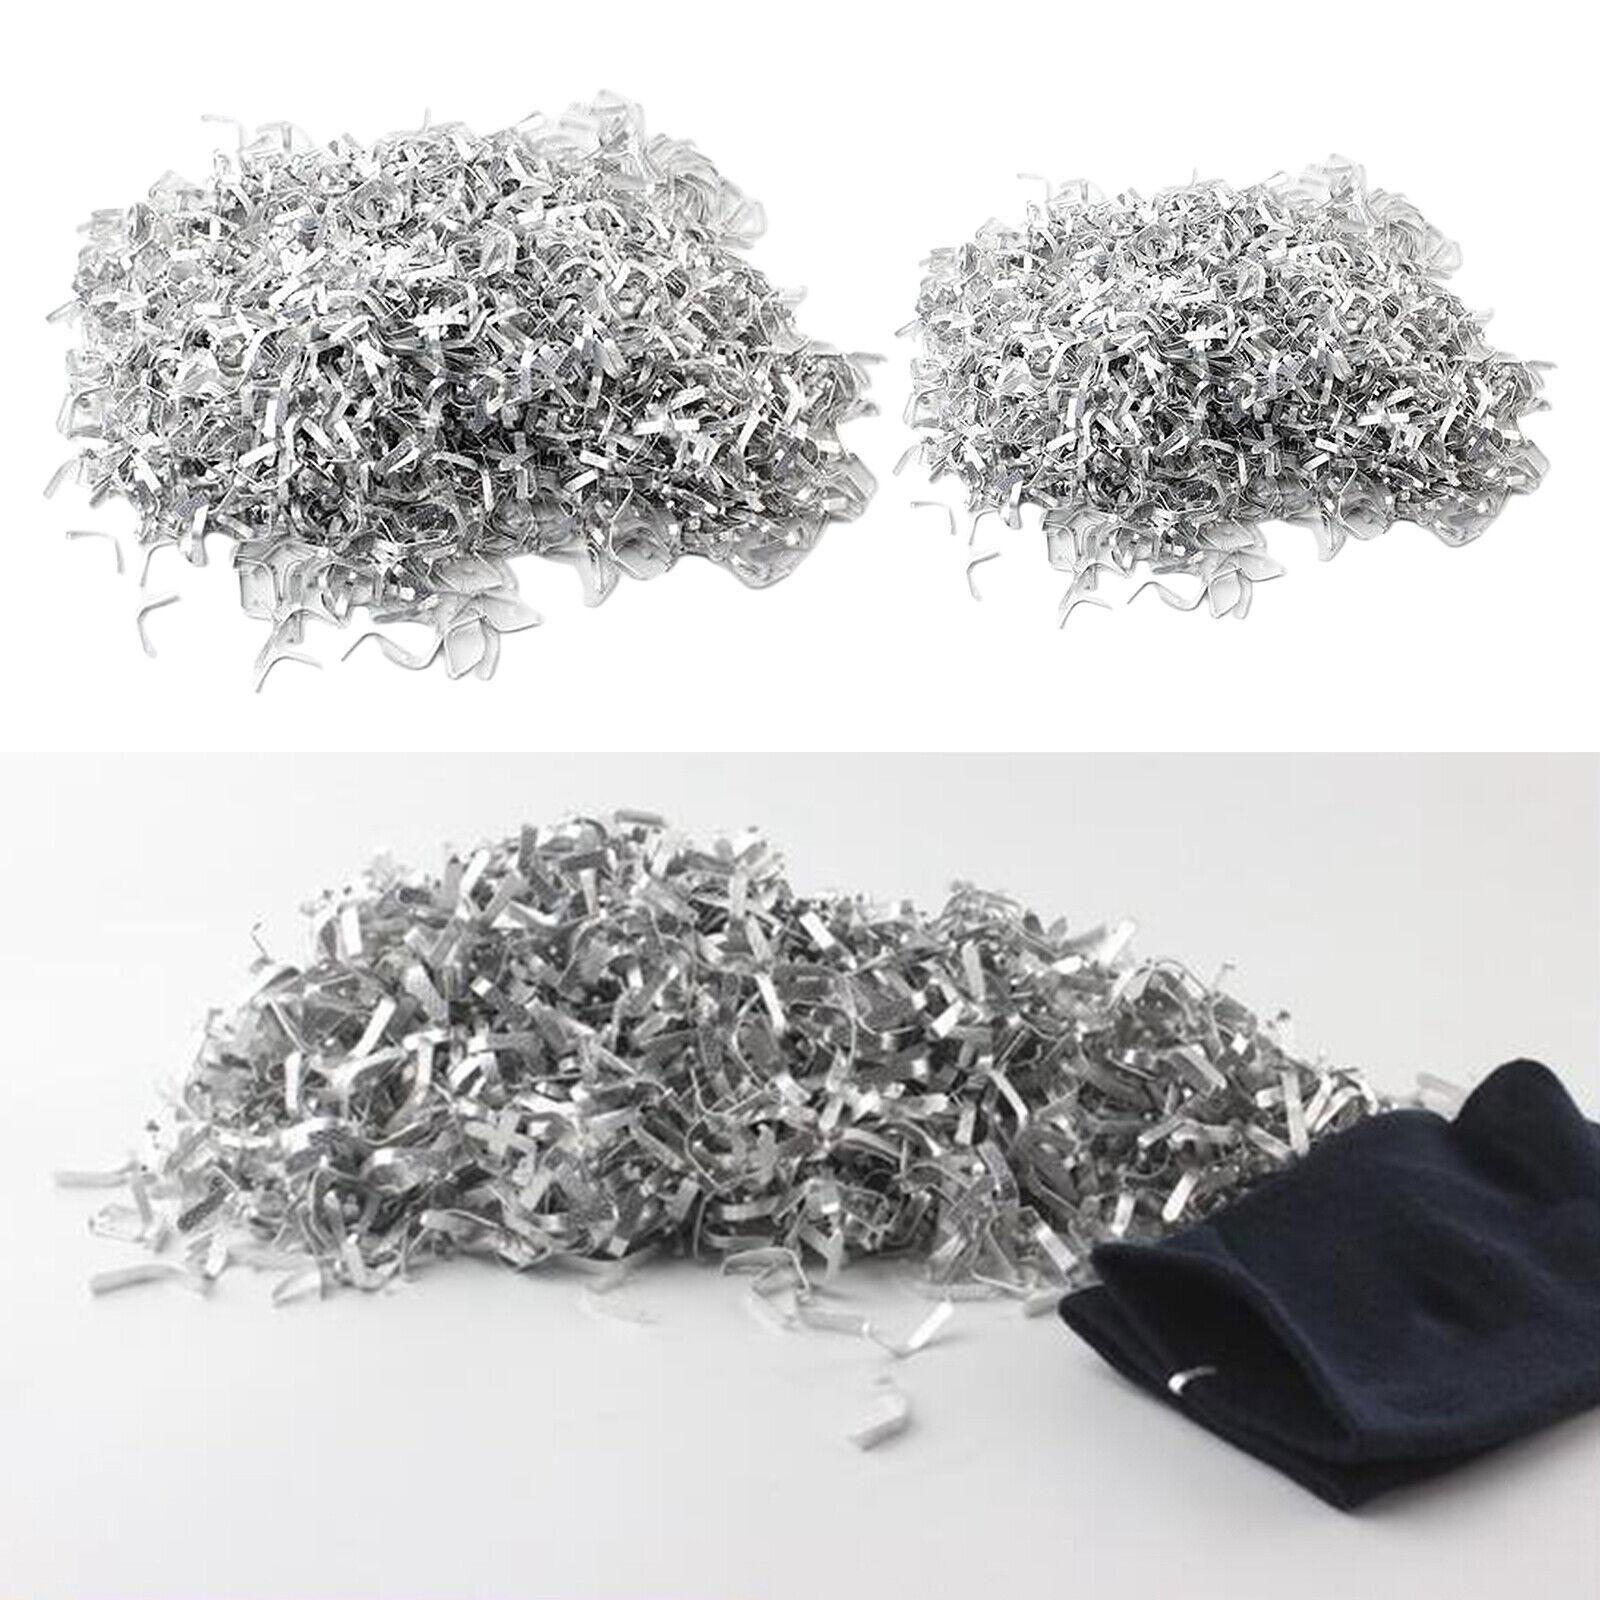 10000x General Socks Packing Clip Sock Snaps Holder Hosiery Accessories